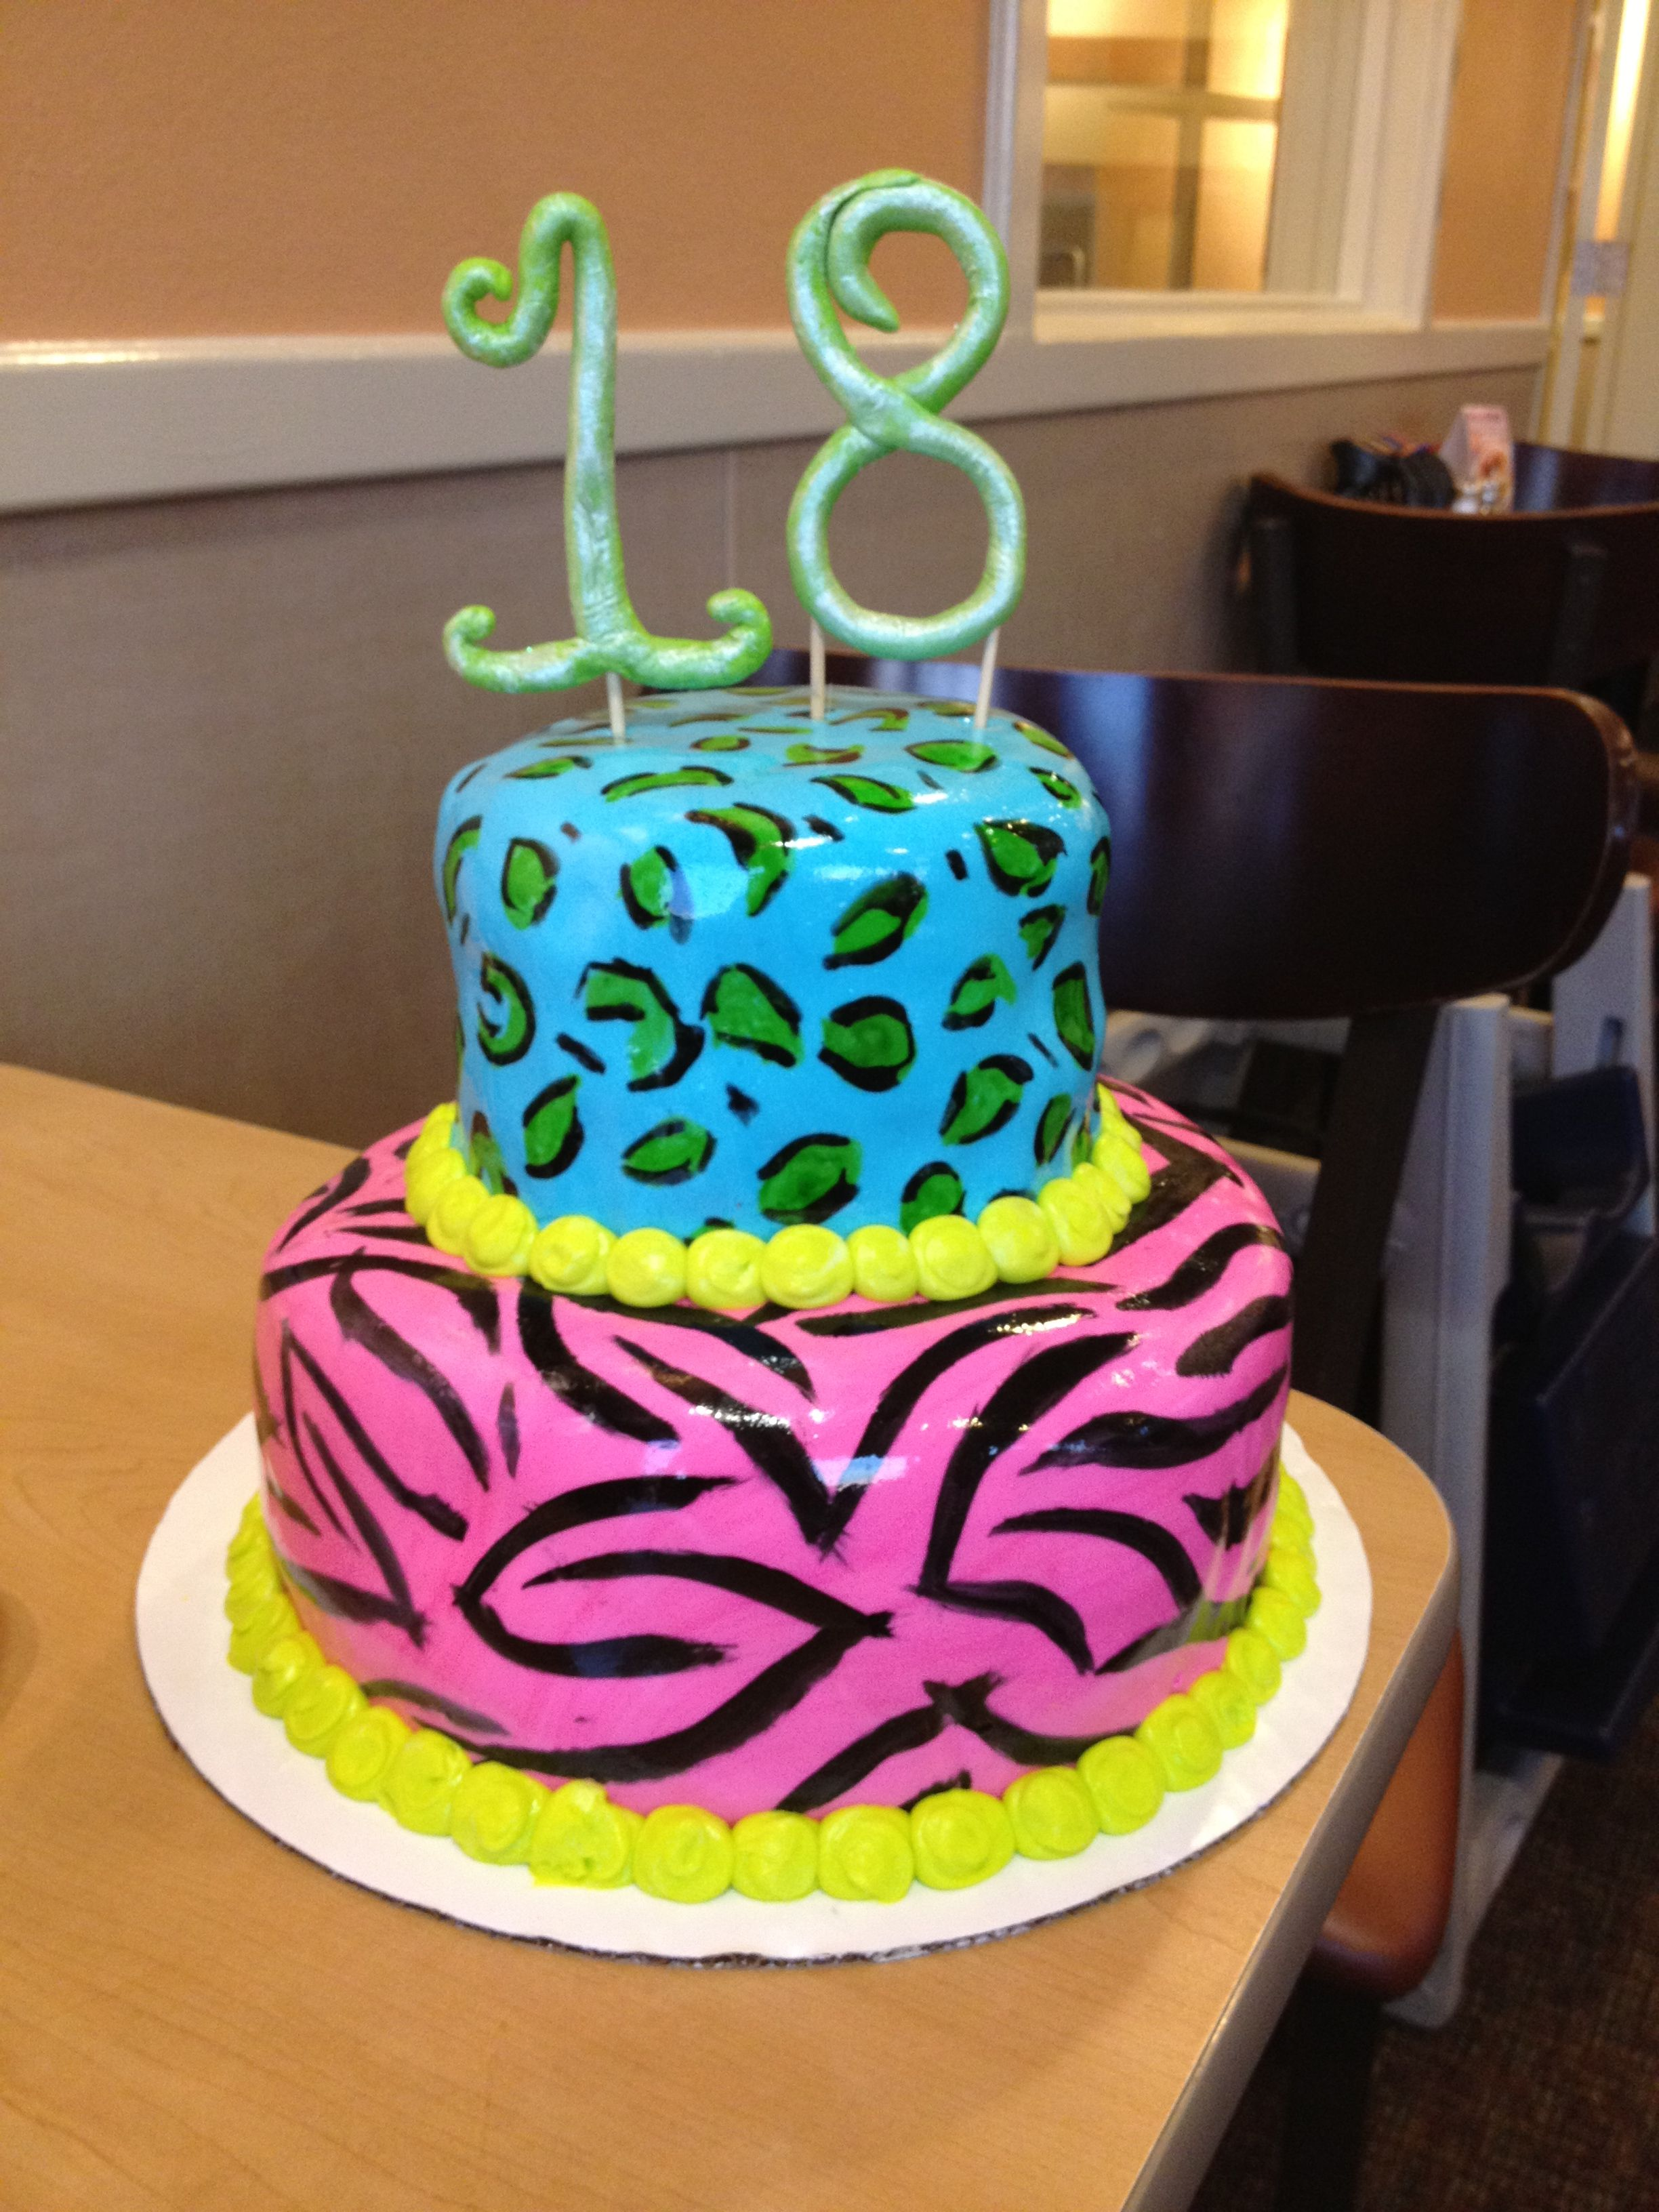 18th birthday cake 18th birthday party 18th birthday